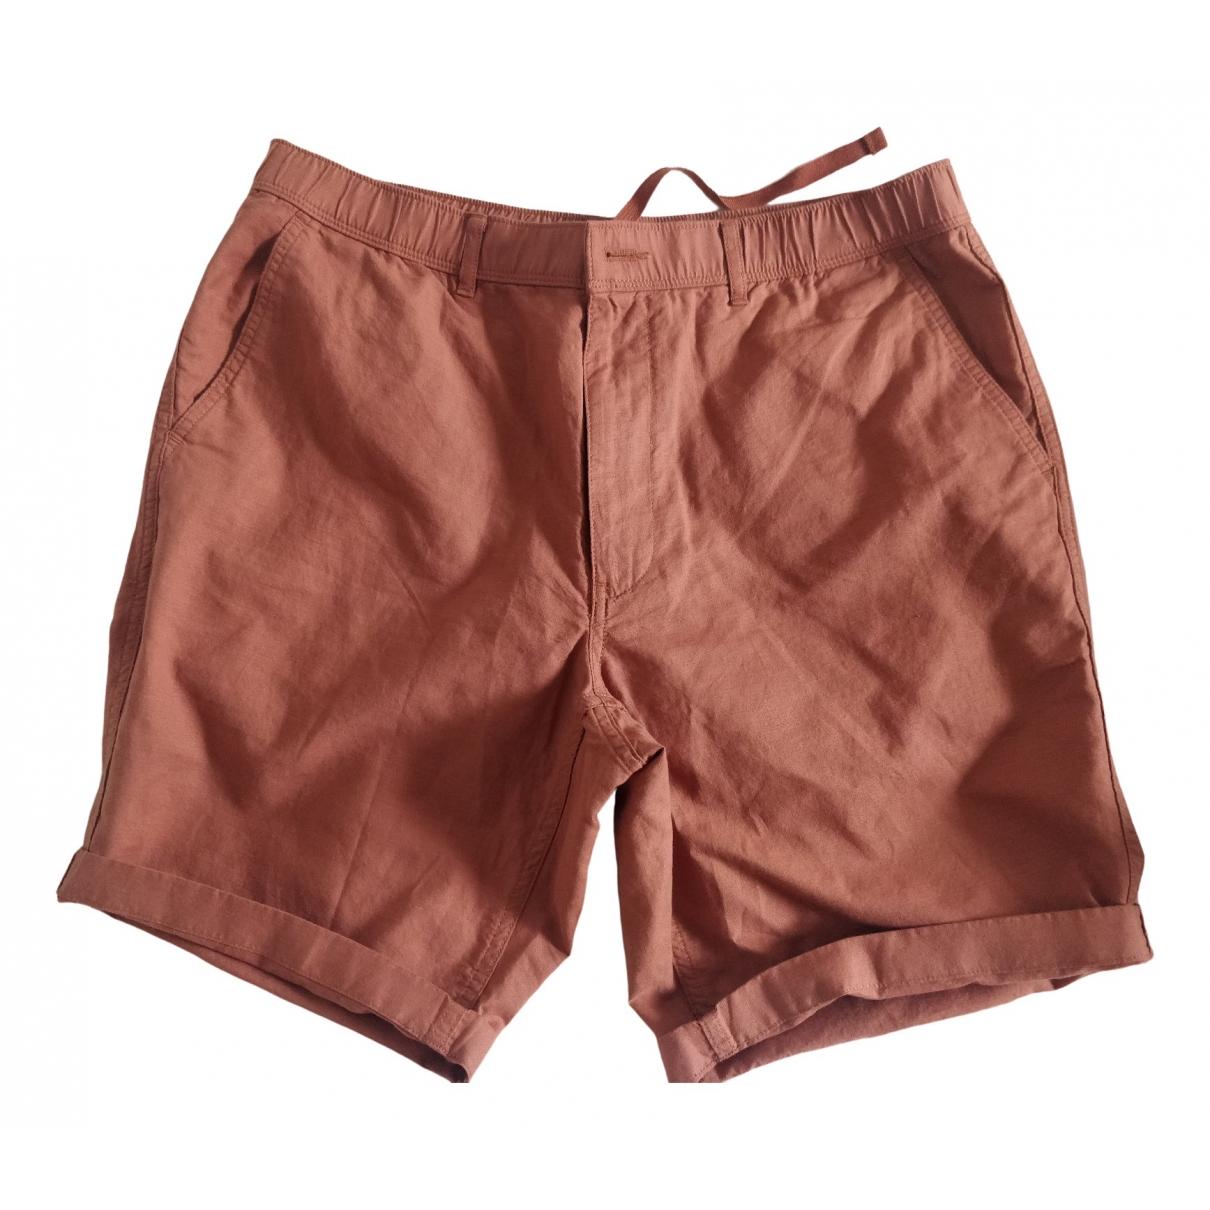 Uniqlo \N Orange Cotton Shorts for Men L International